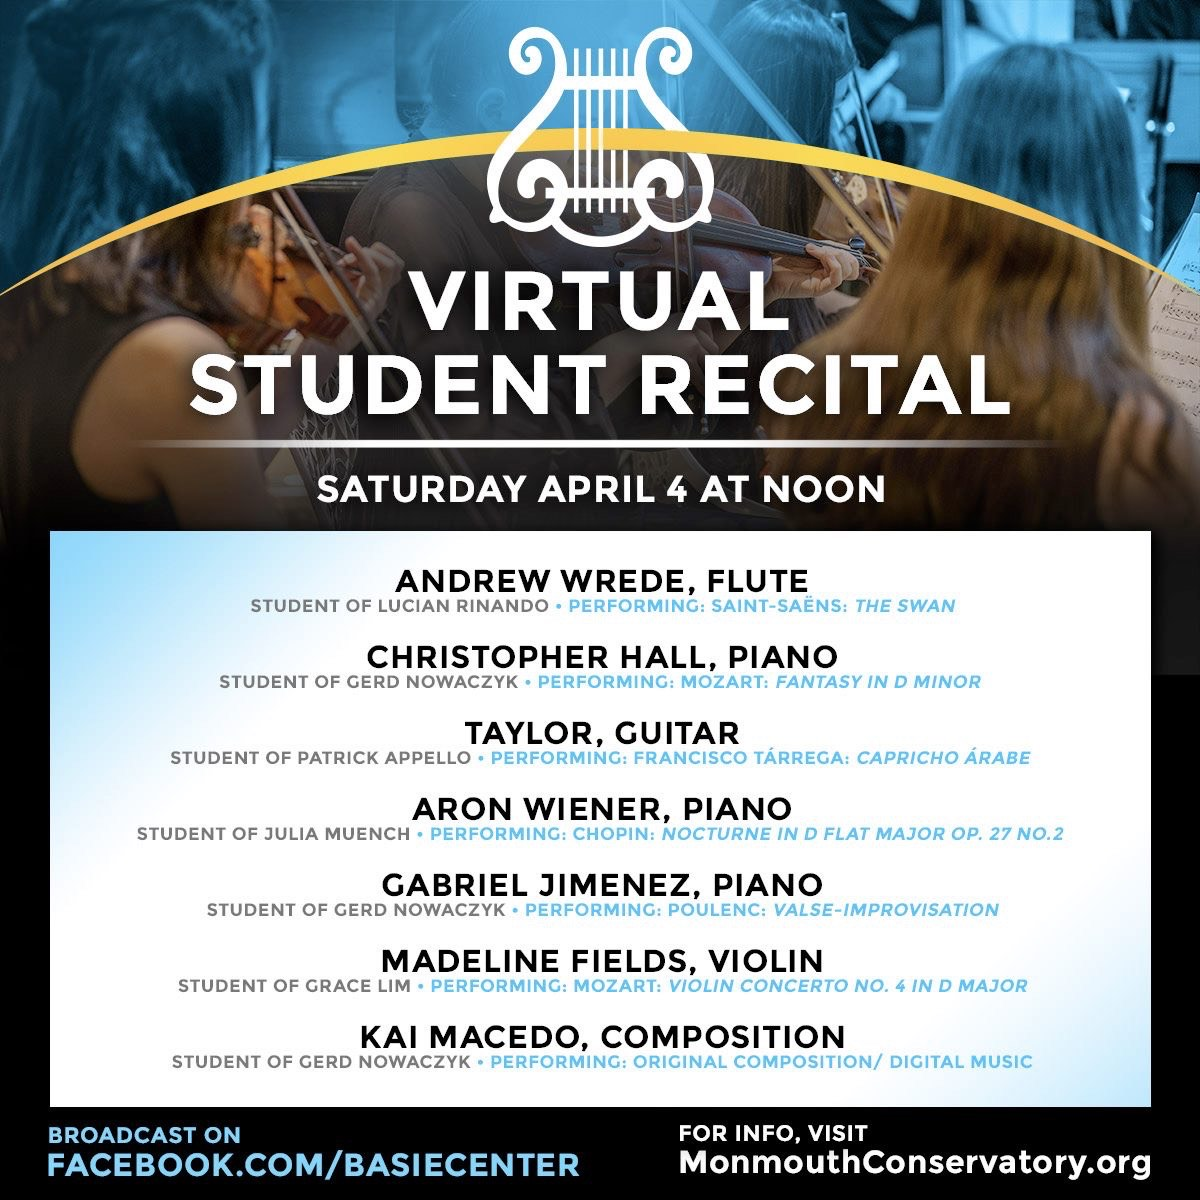 Virtual Student Recital – Watch On Facebook Live